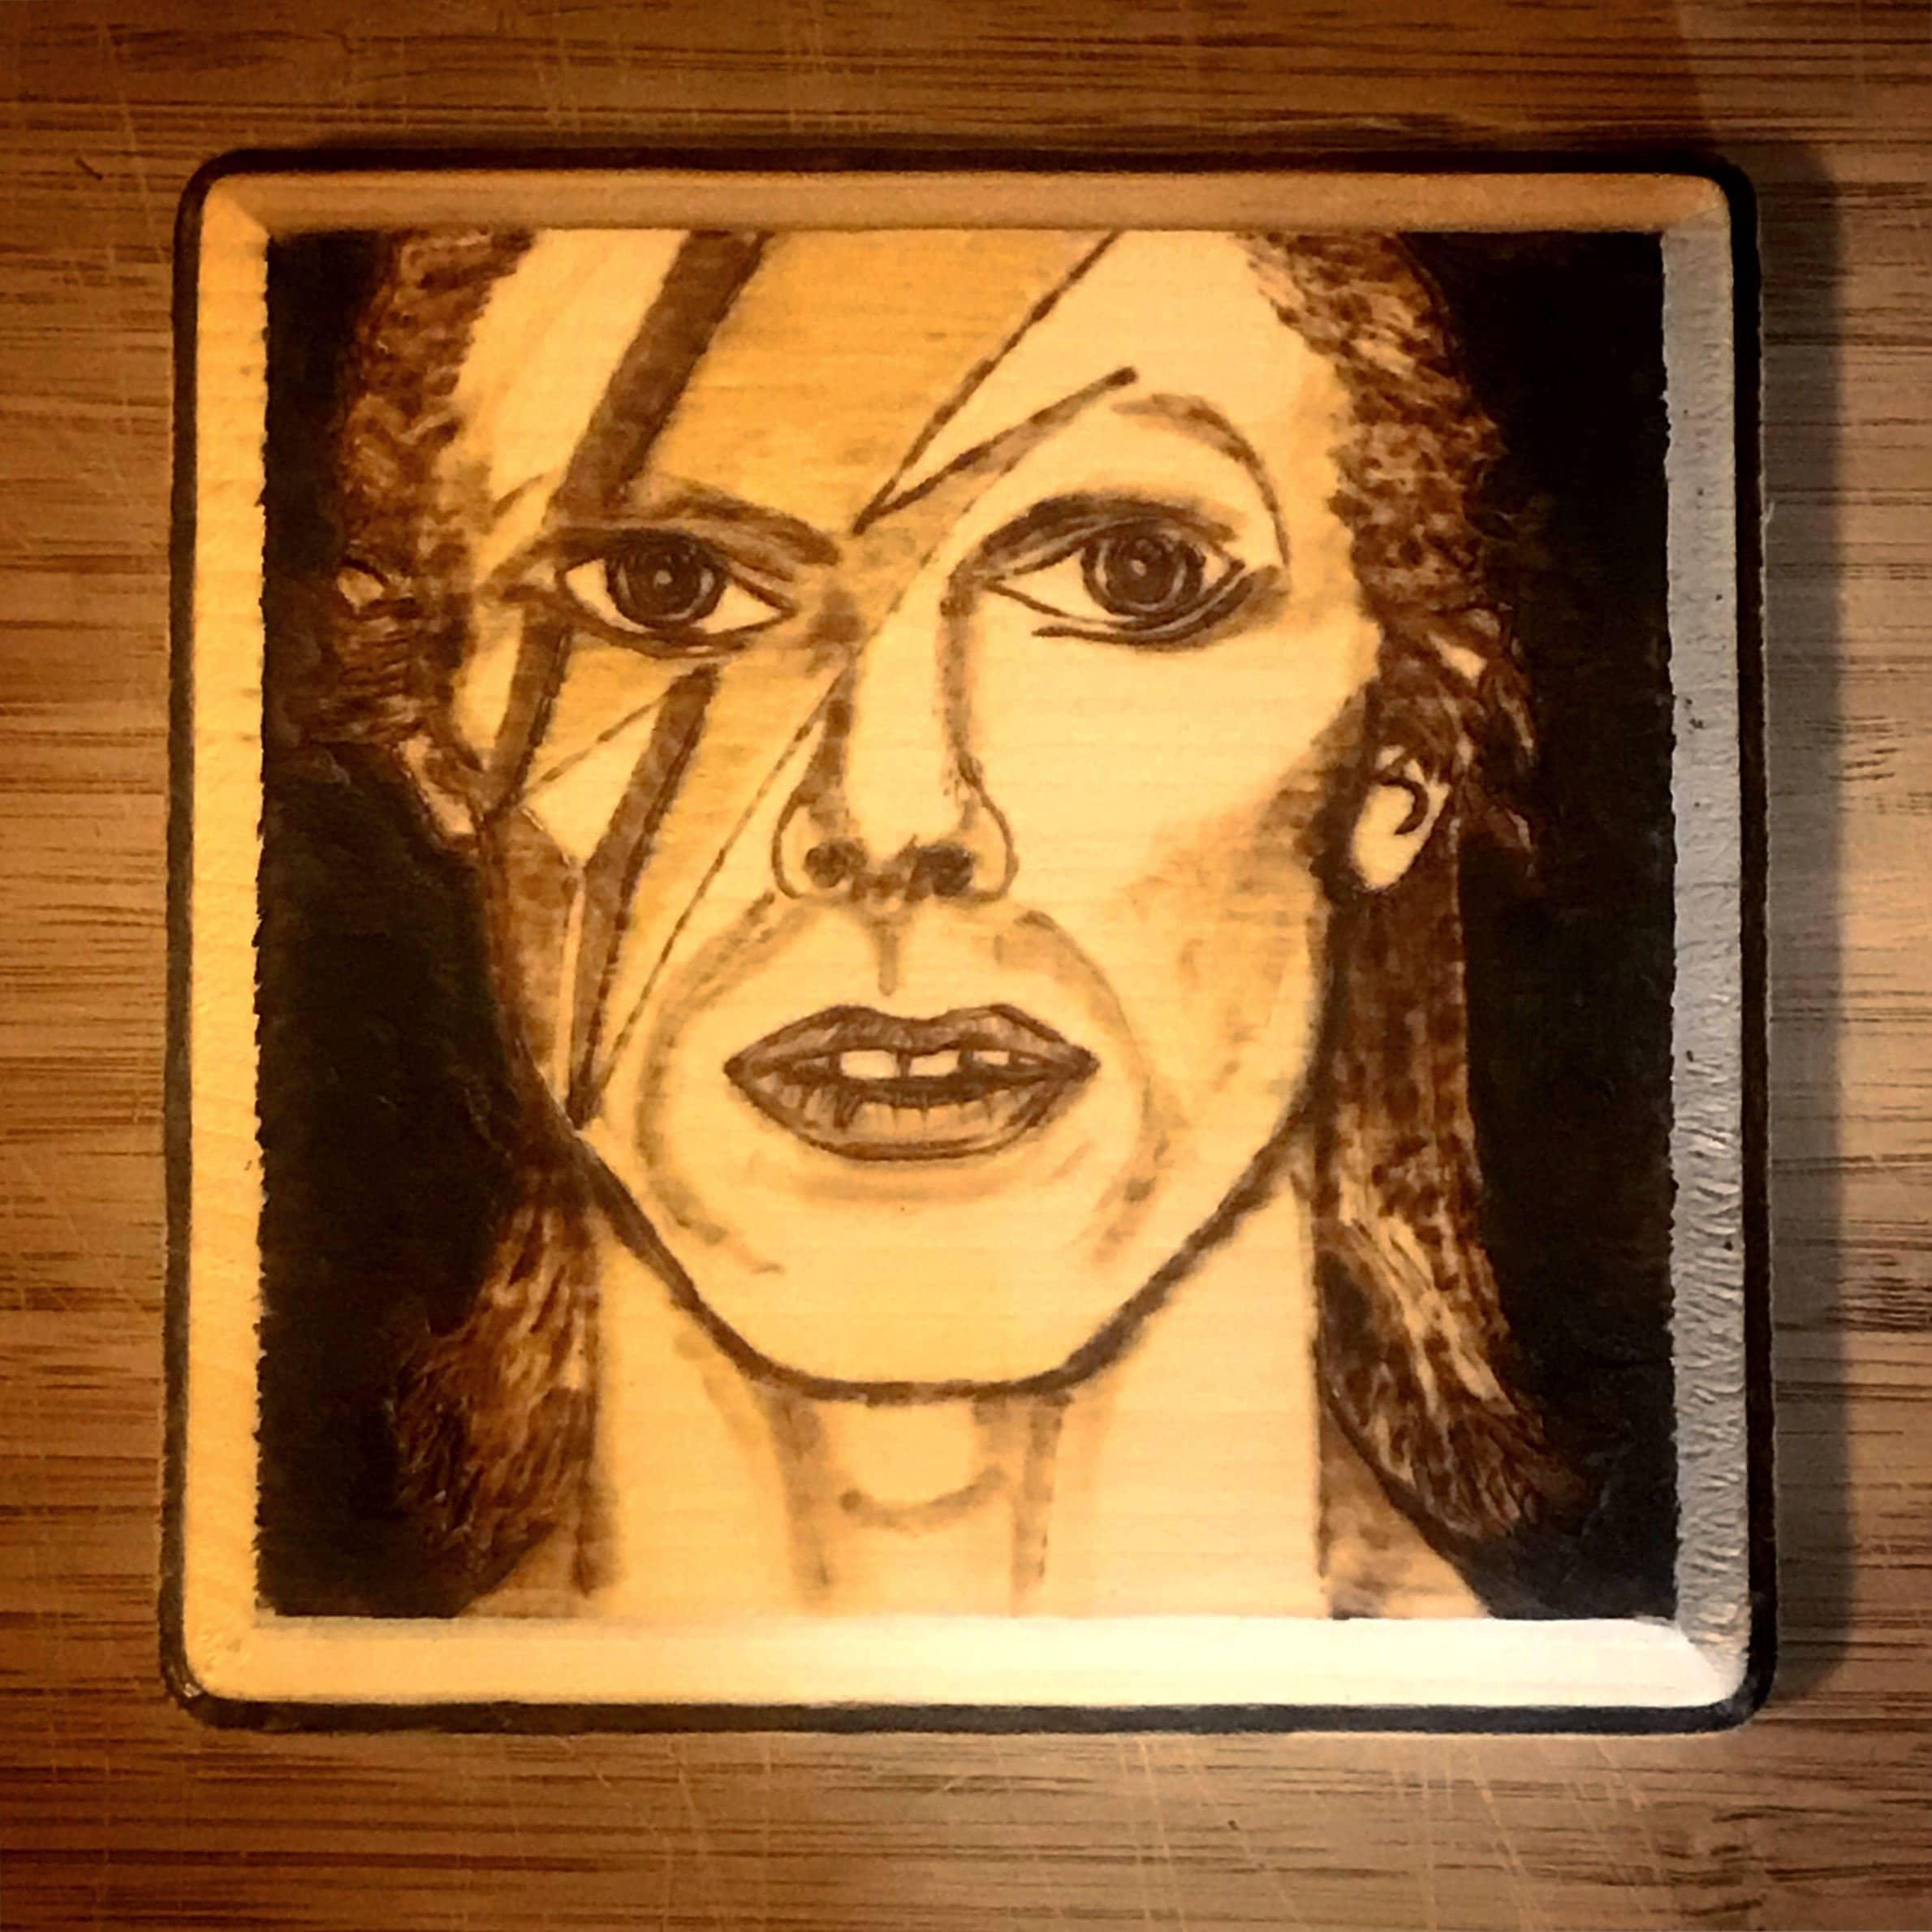 David Bowie Aladdin Sane | Etsy